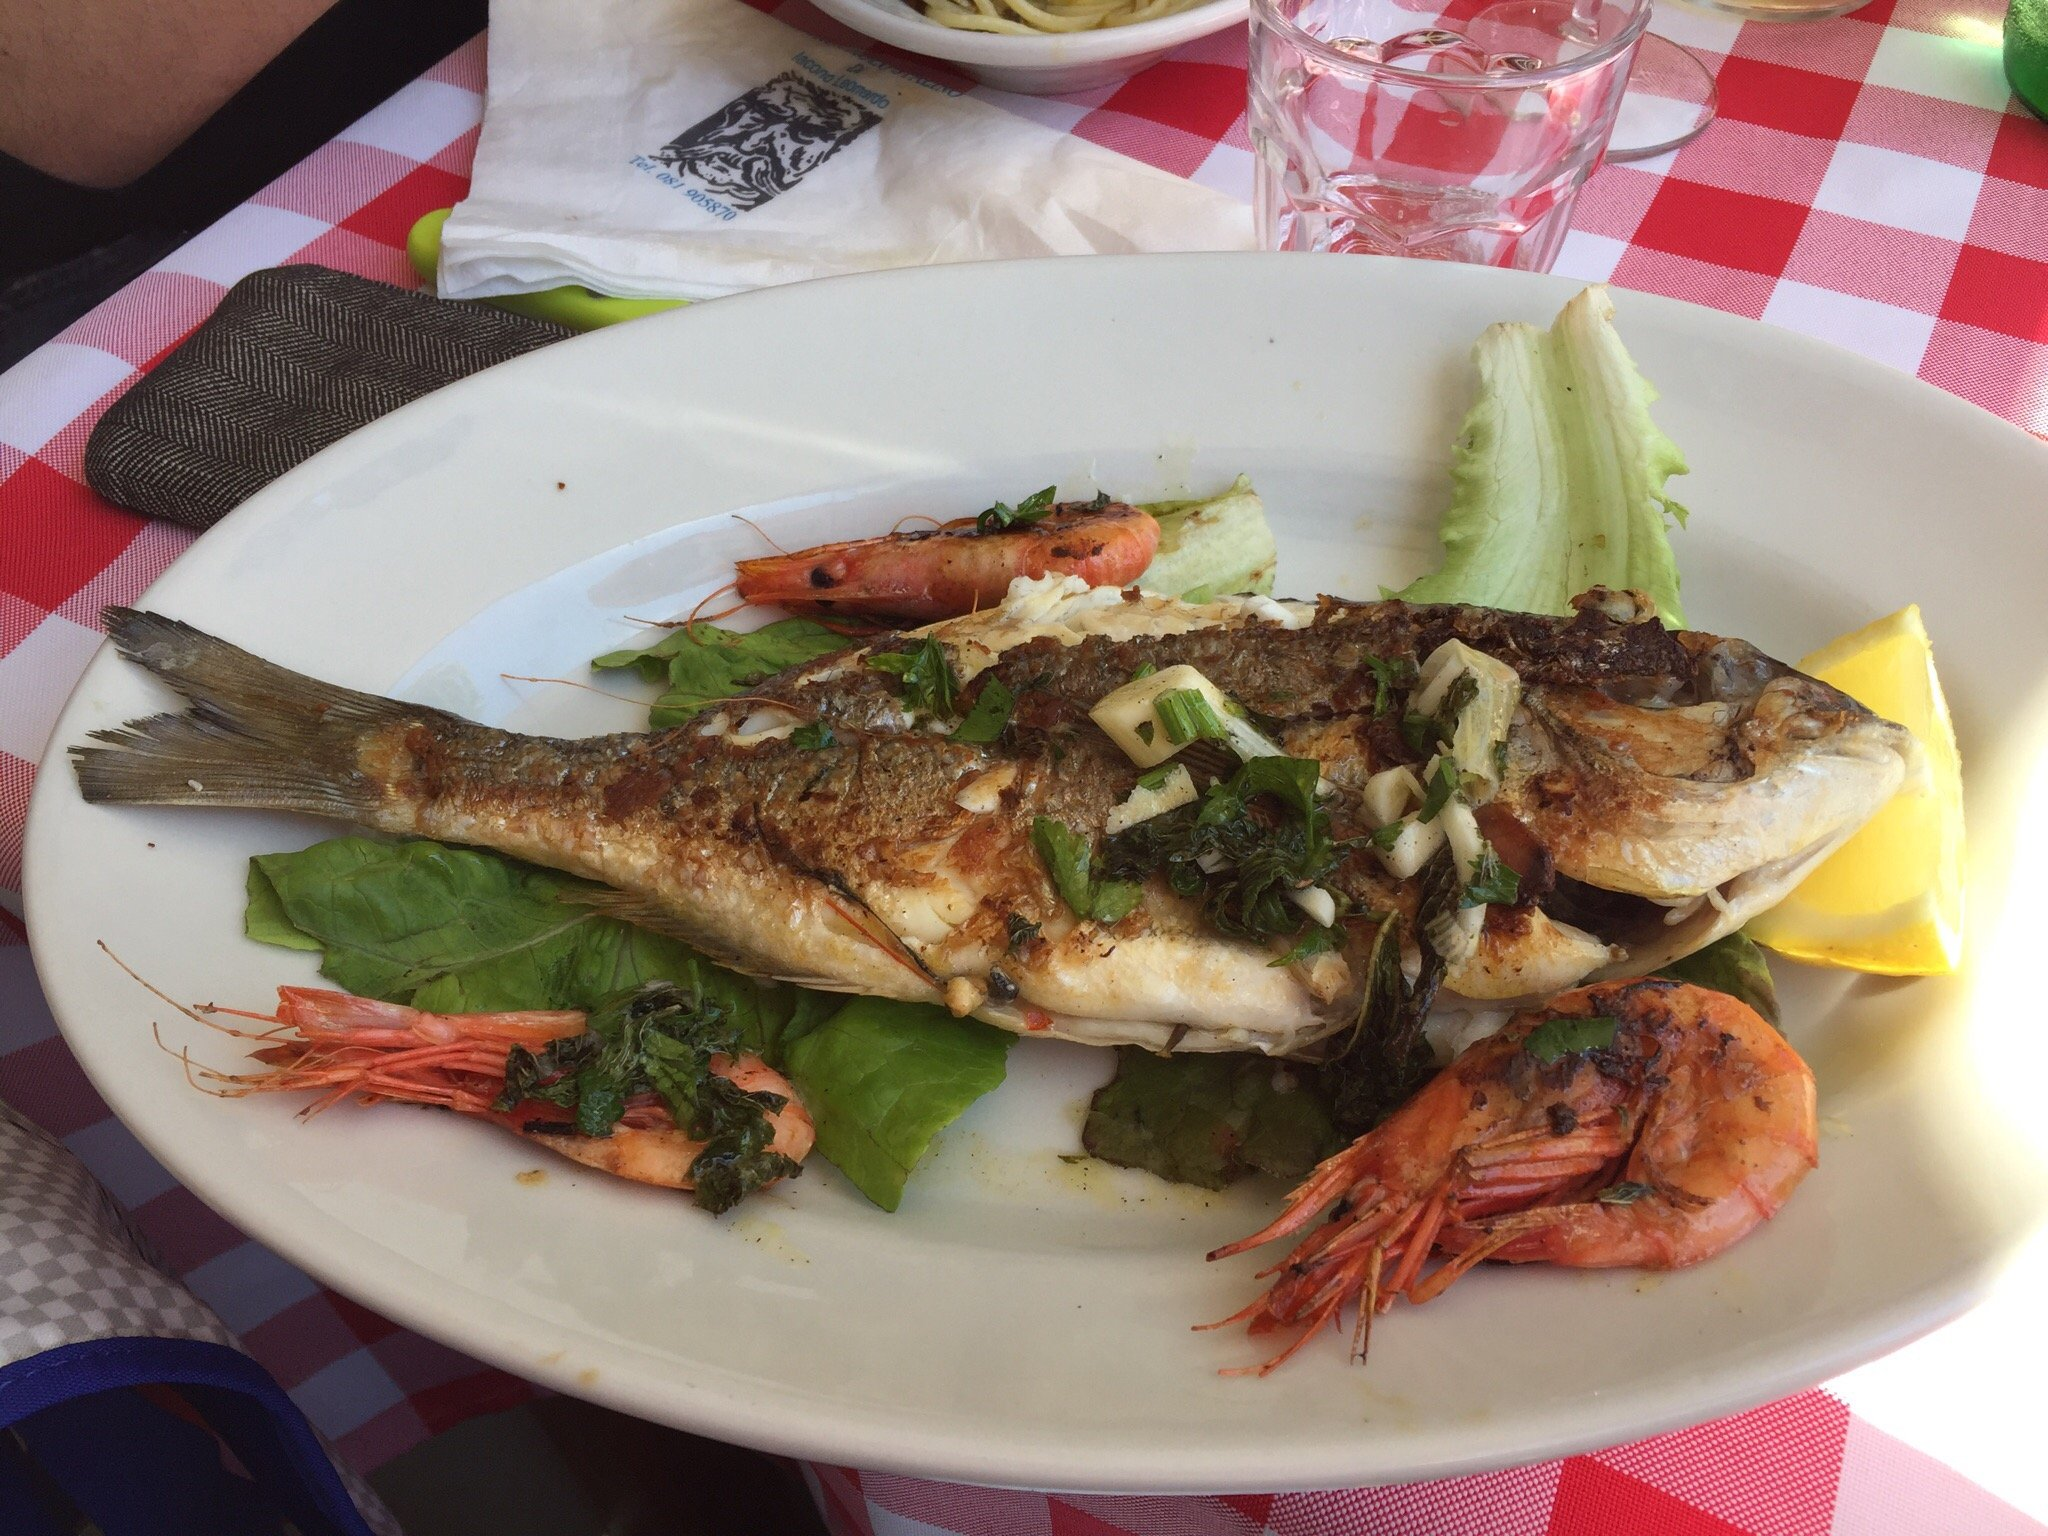 Serrara Fontana, Province of Naples Food Guide: 10 Seafood food Must-Eat Restaurants & Street Food Stalls in Sant'Angelo